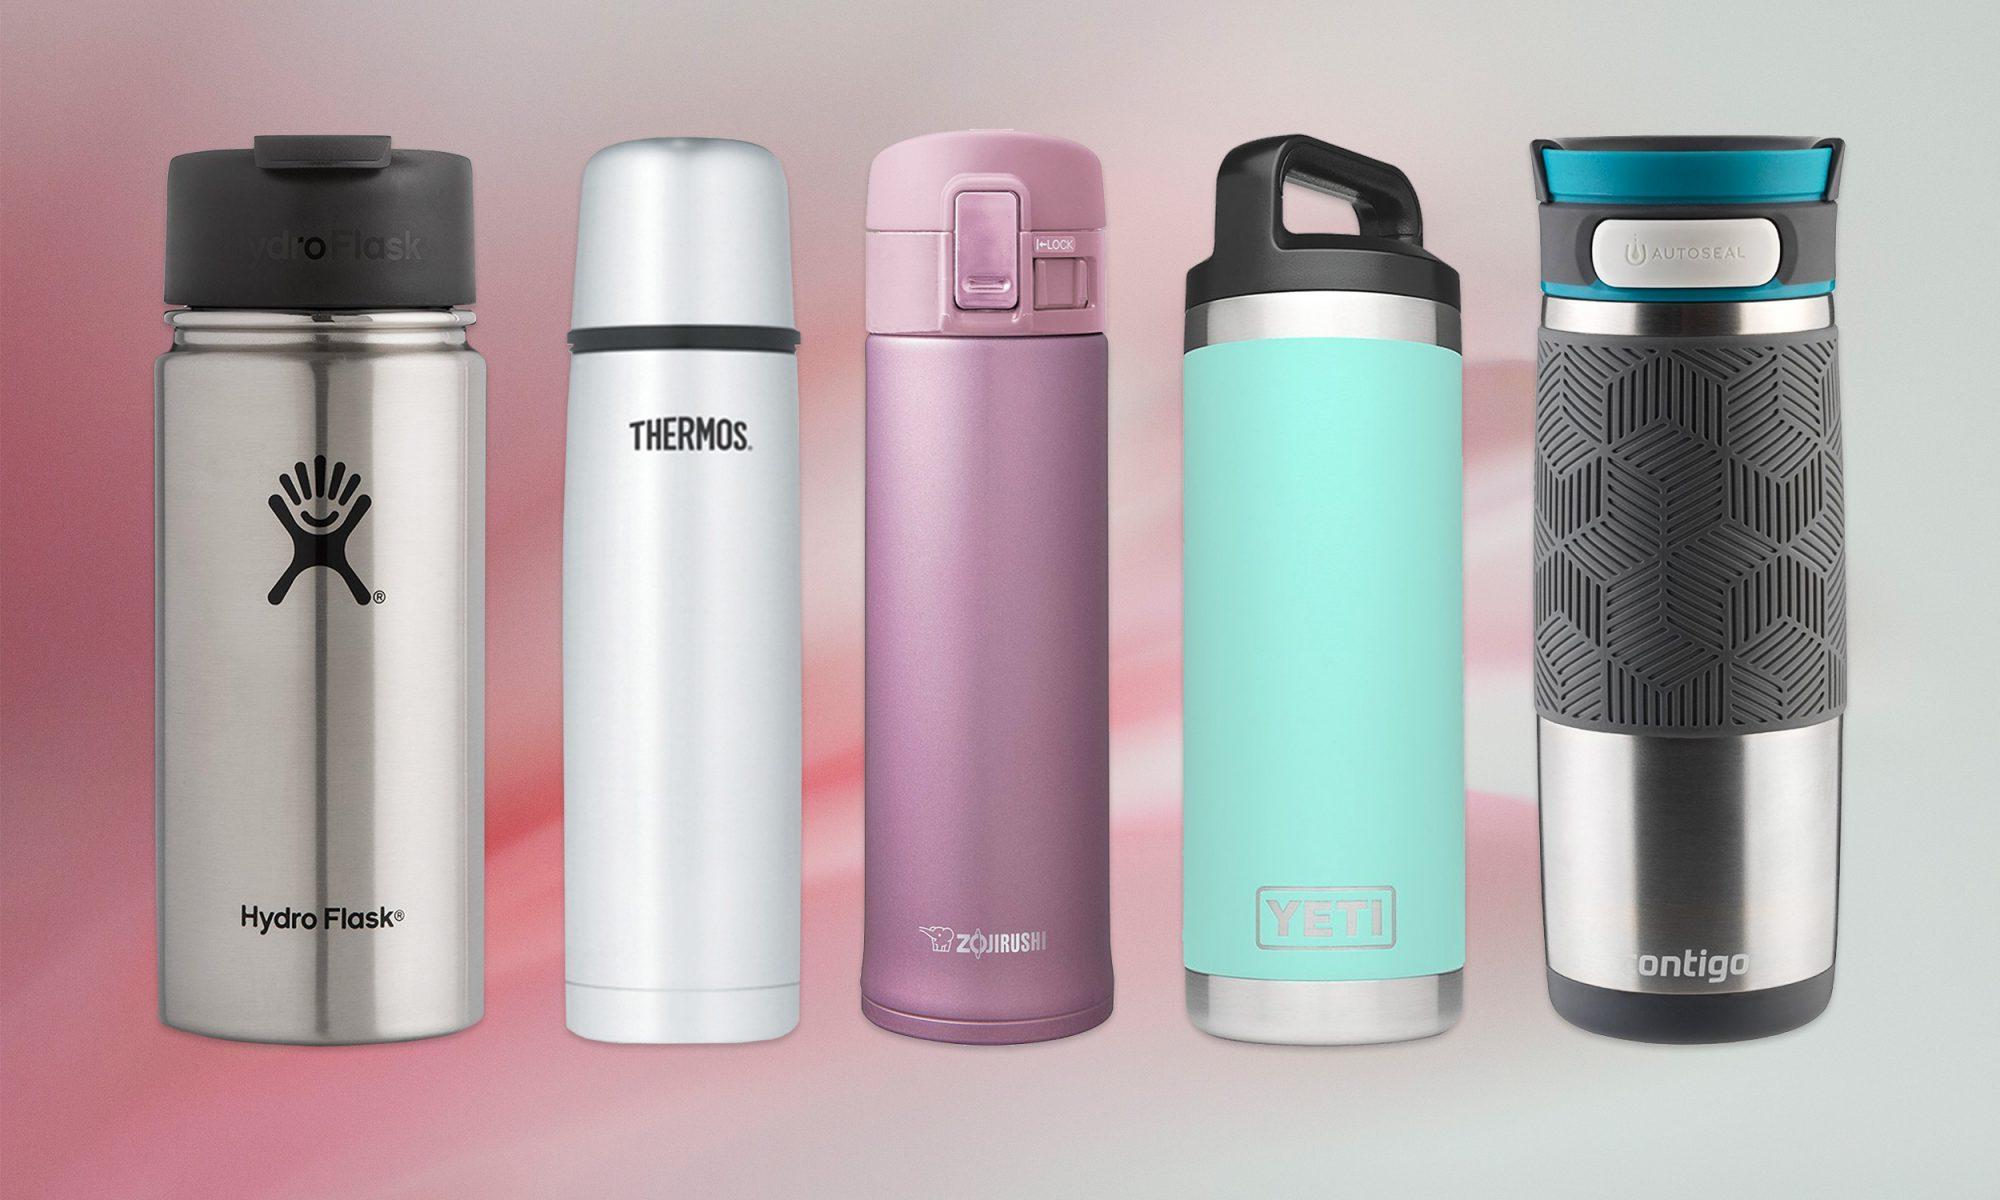 EC: Which Travel Mug Keeps Drinks Warm the Longest?